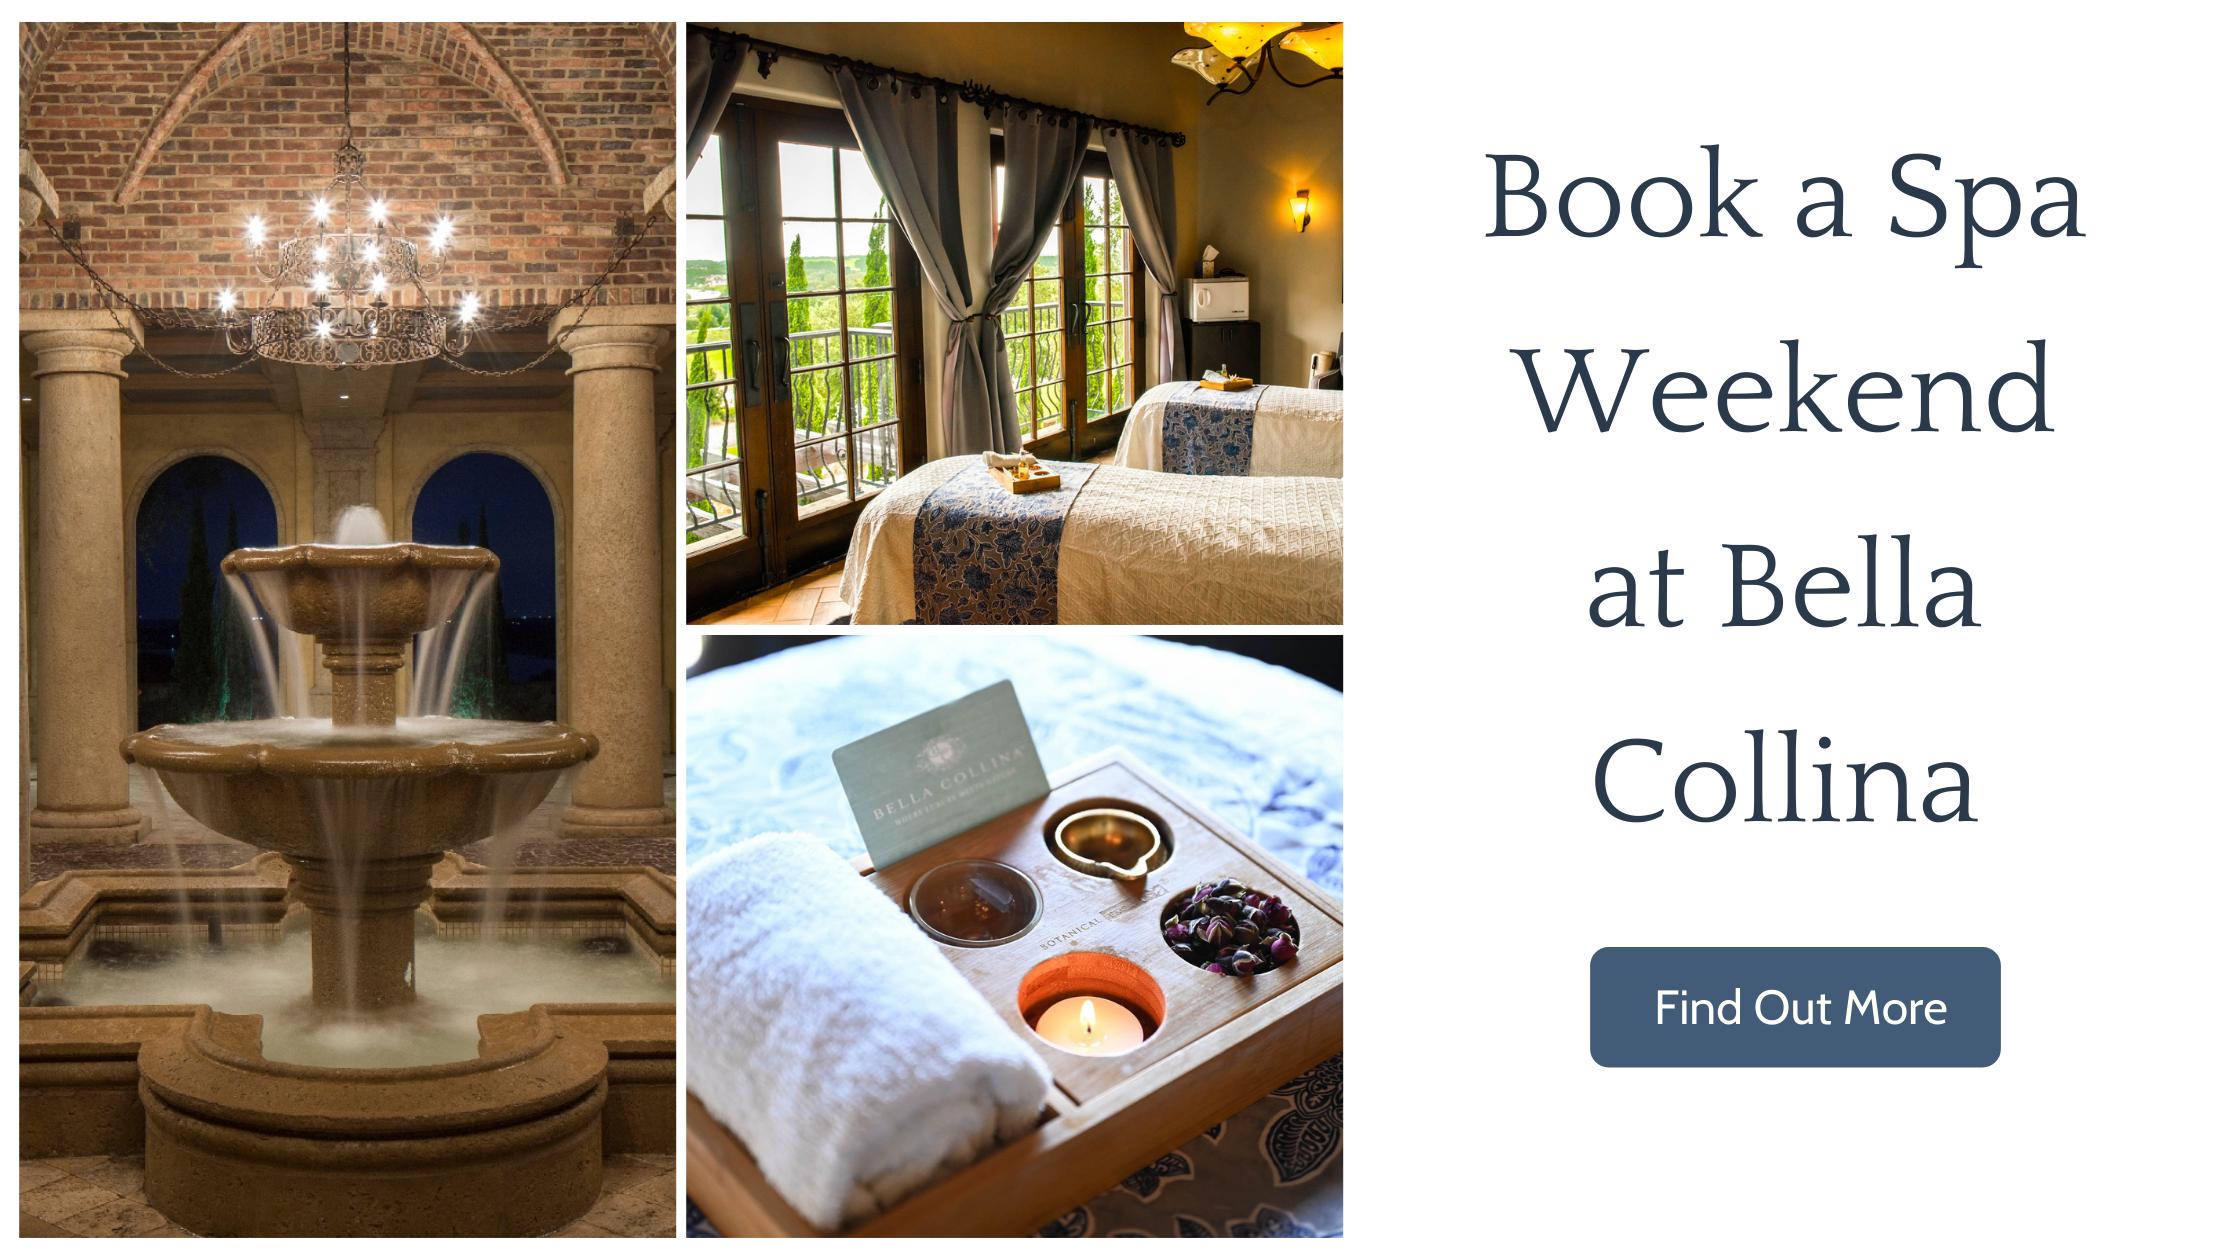 Book a Spa Weekend at Bella Collina